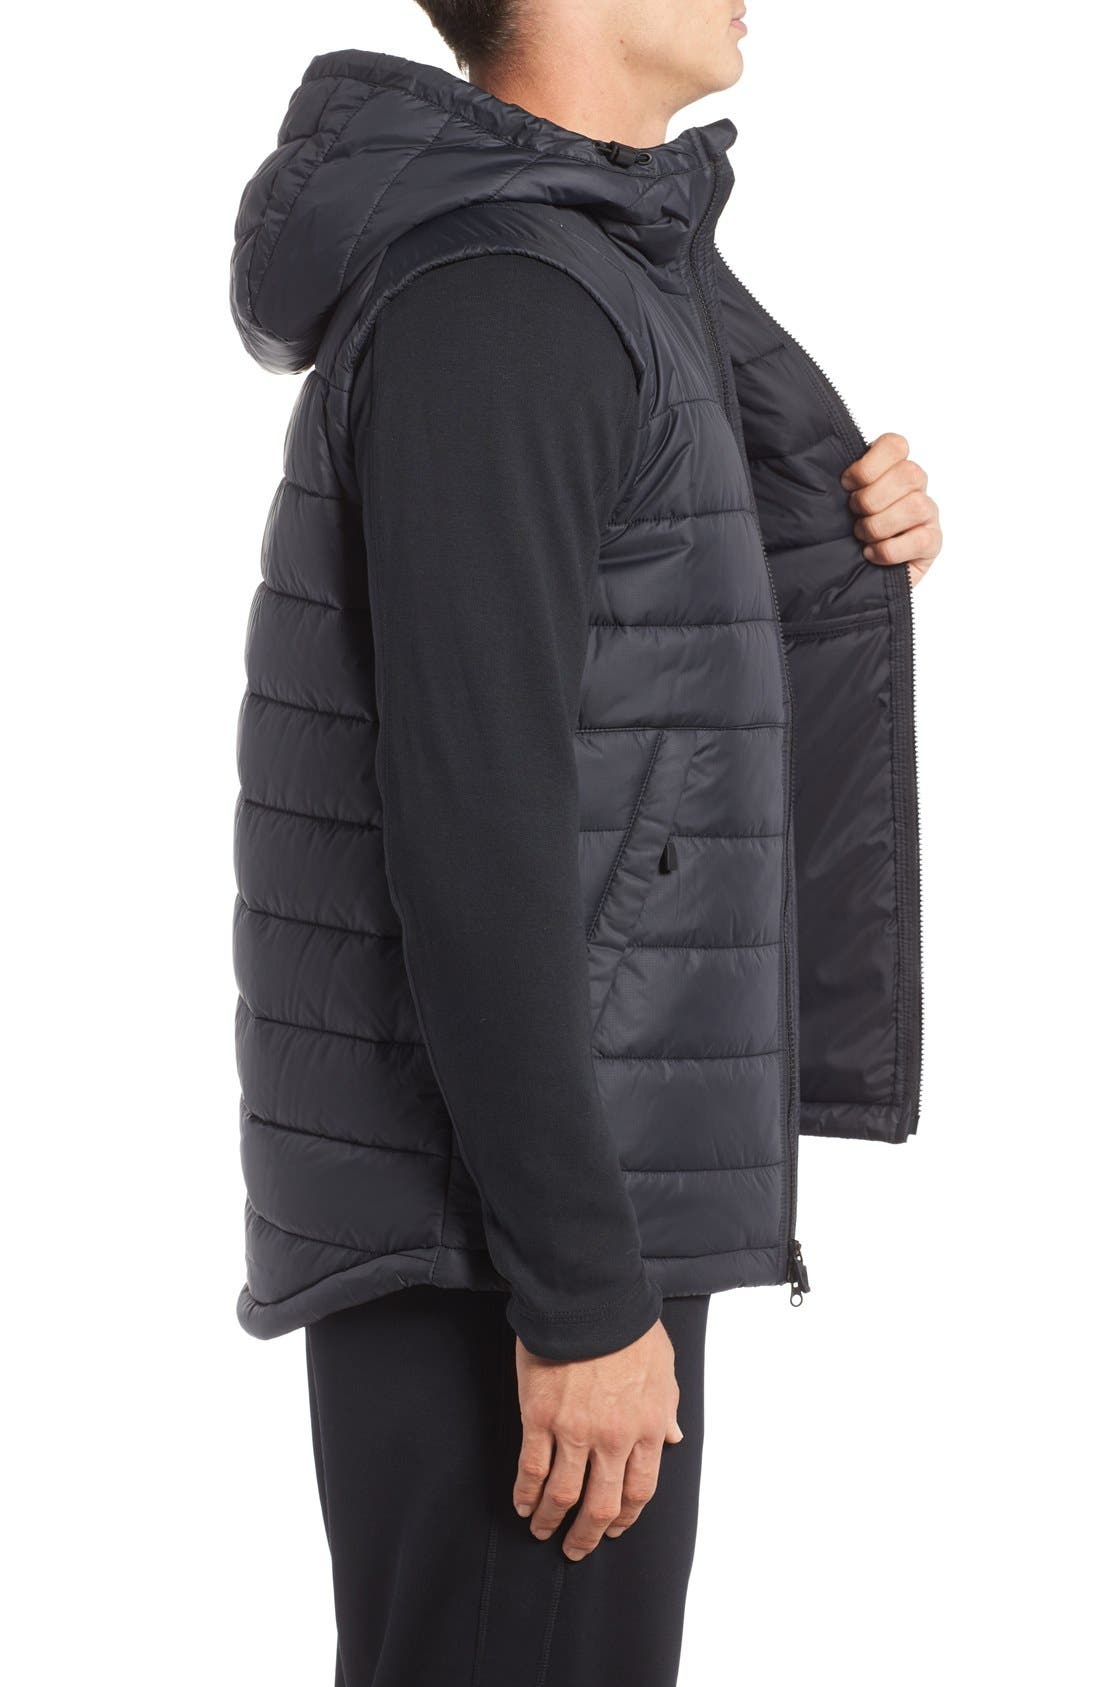 NIKE,                             Sportswear Advance 15 Jacket,                             Alternate thumbnail 6, color,                             010